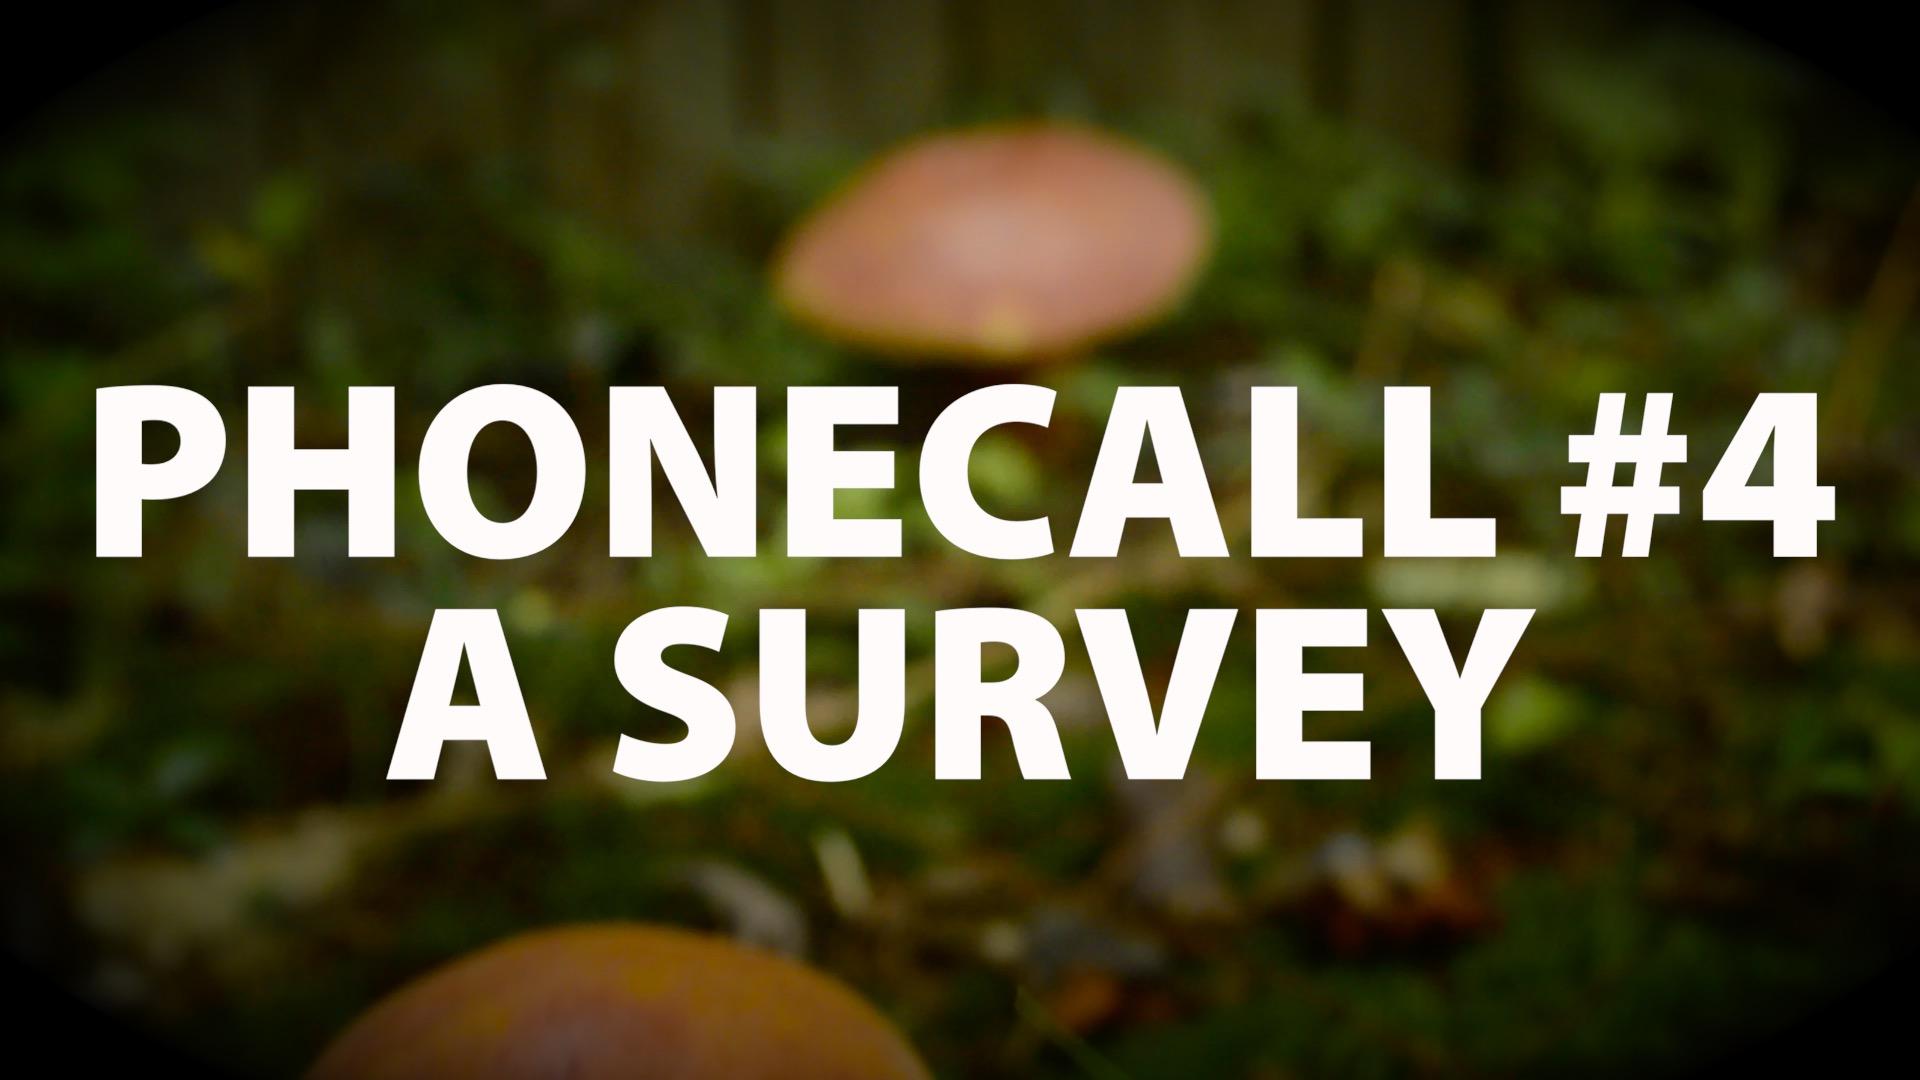 Phonecall: #4 A Survey